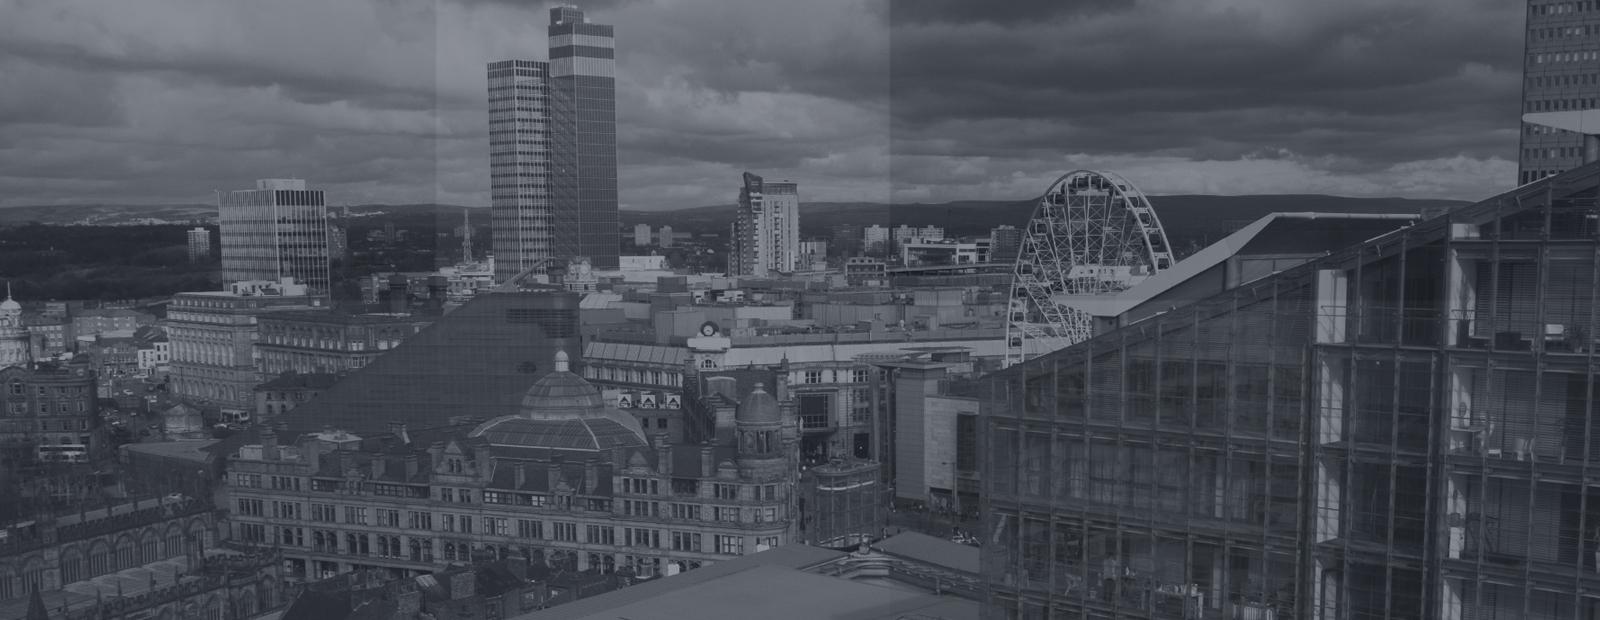 Manchester-Skyline-1